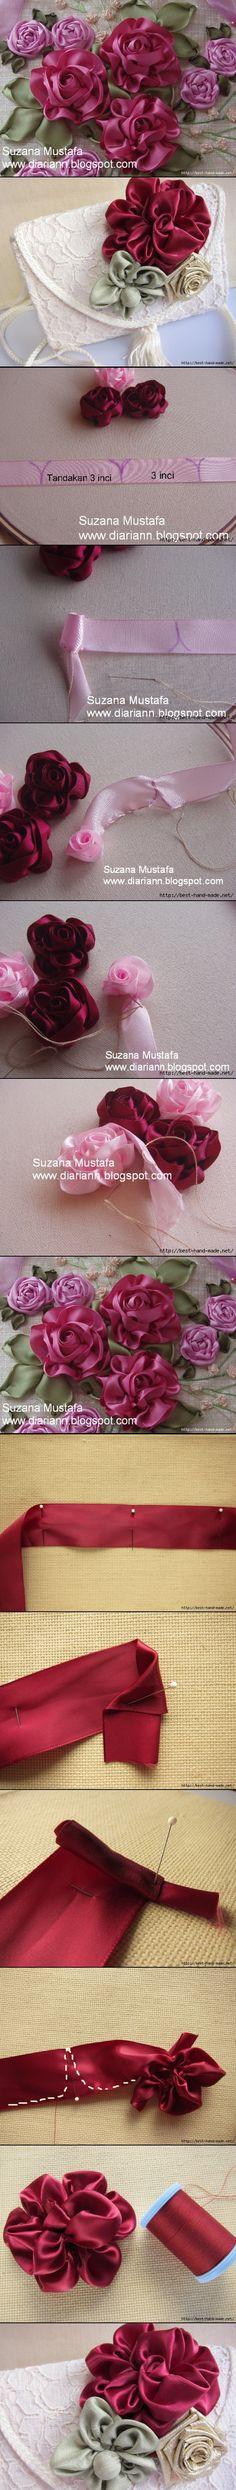 http://www.liveinternet.ru/users/marinamila/post272094477/ ribbon rose, crafts to try, flower, ribbon work